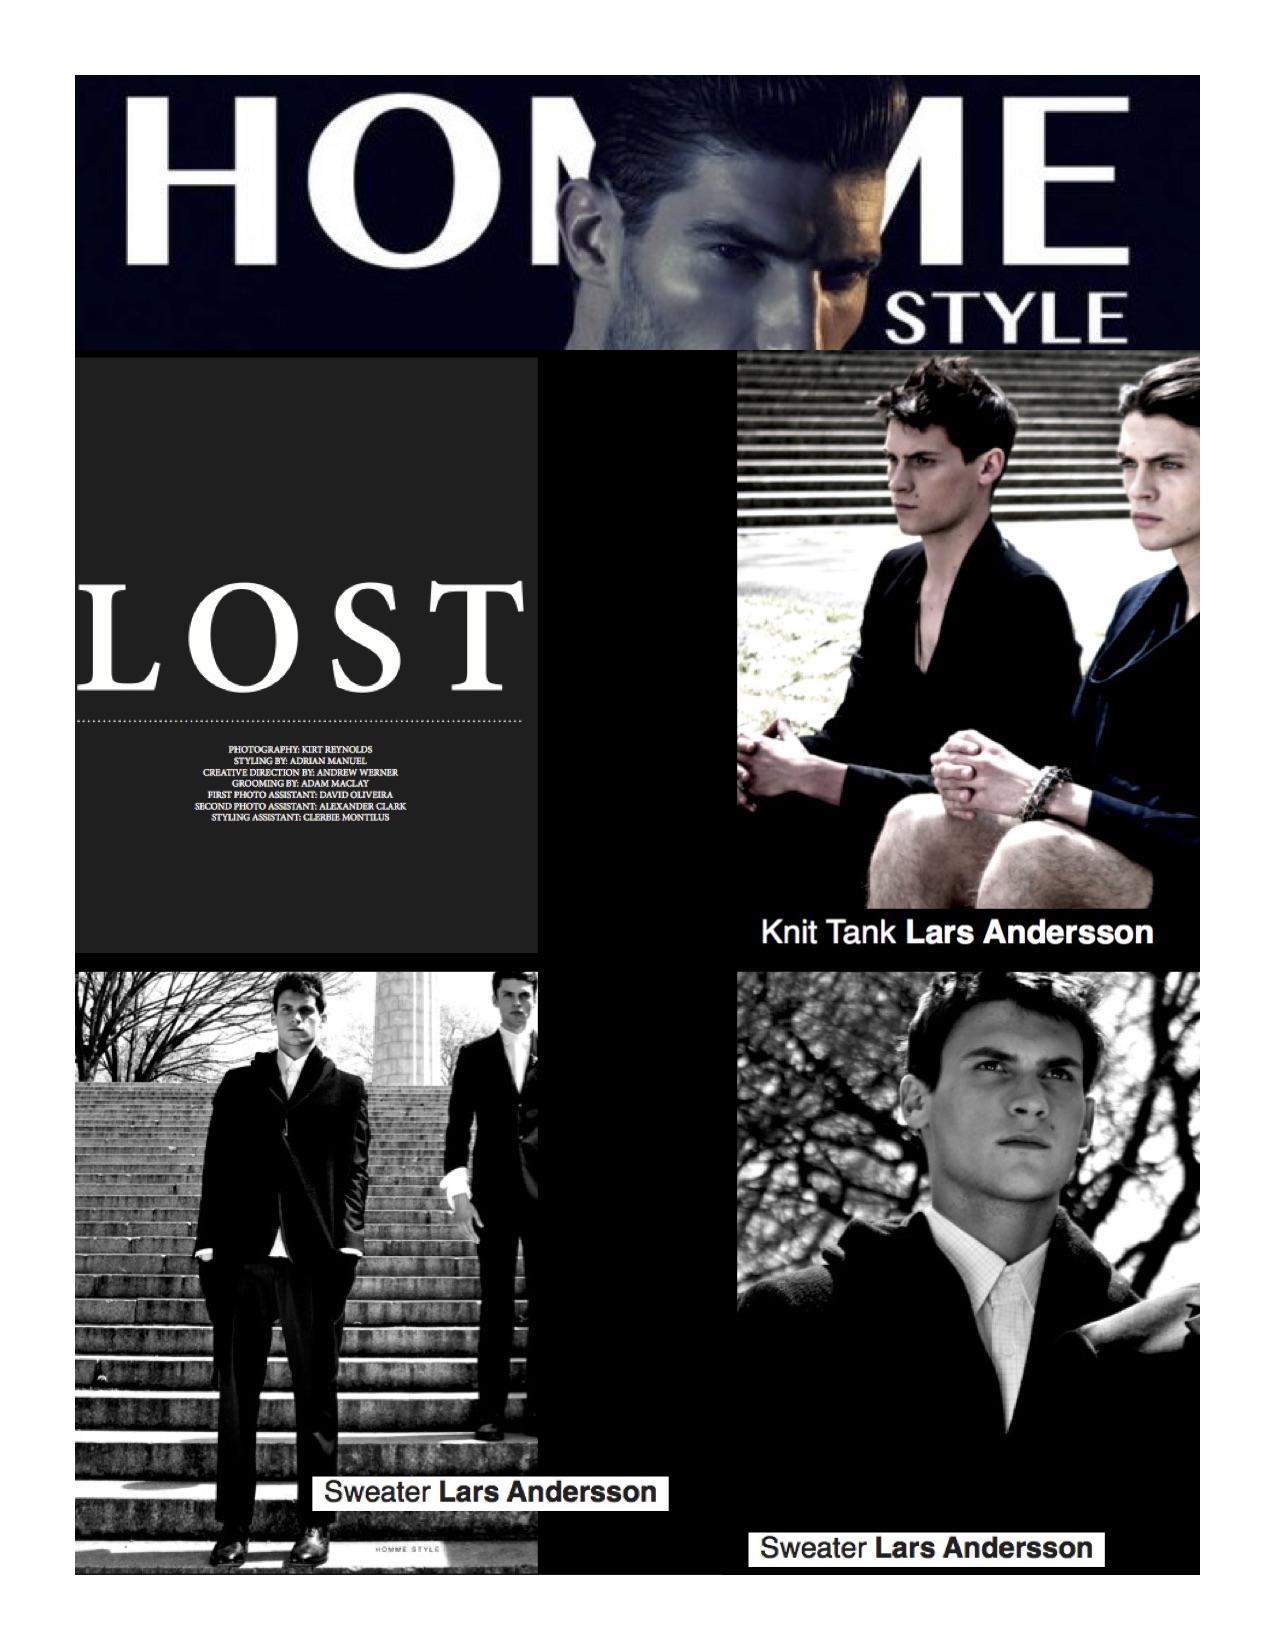 Lars Andersson - Homme Style  - 07.09.12 copy 2.jpg